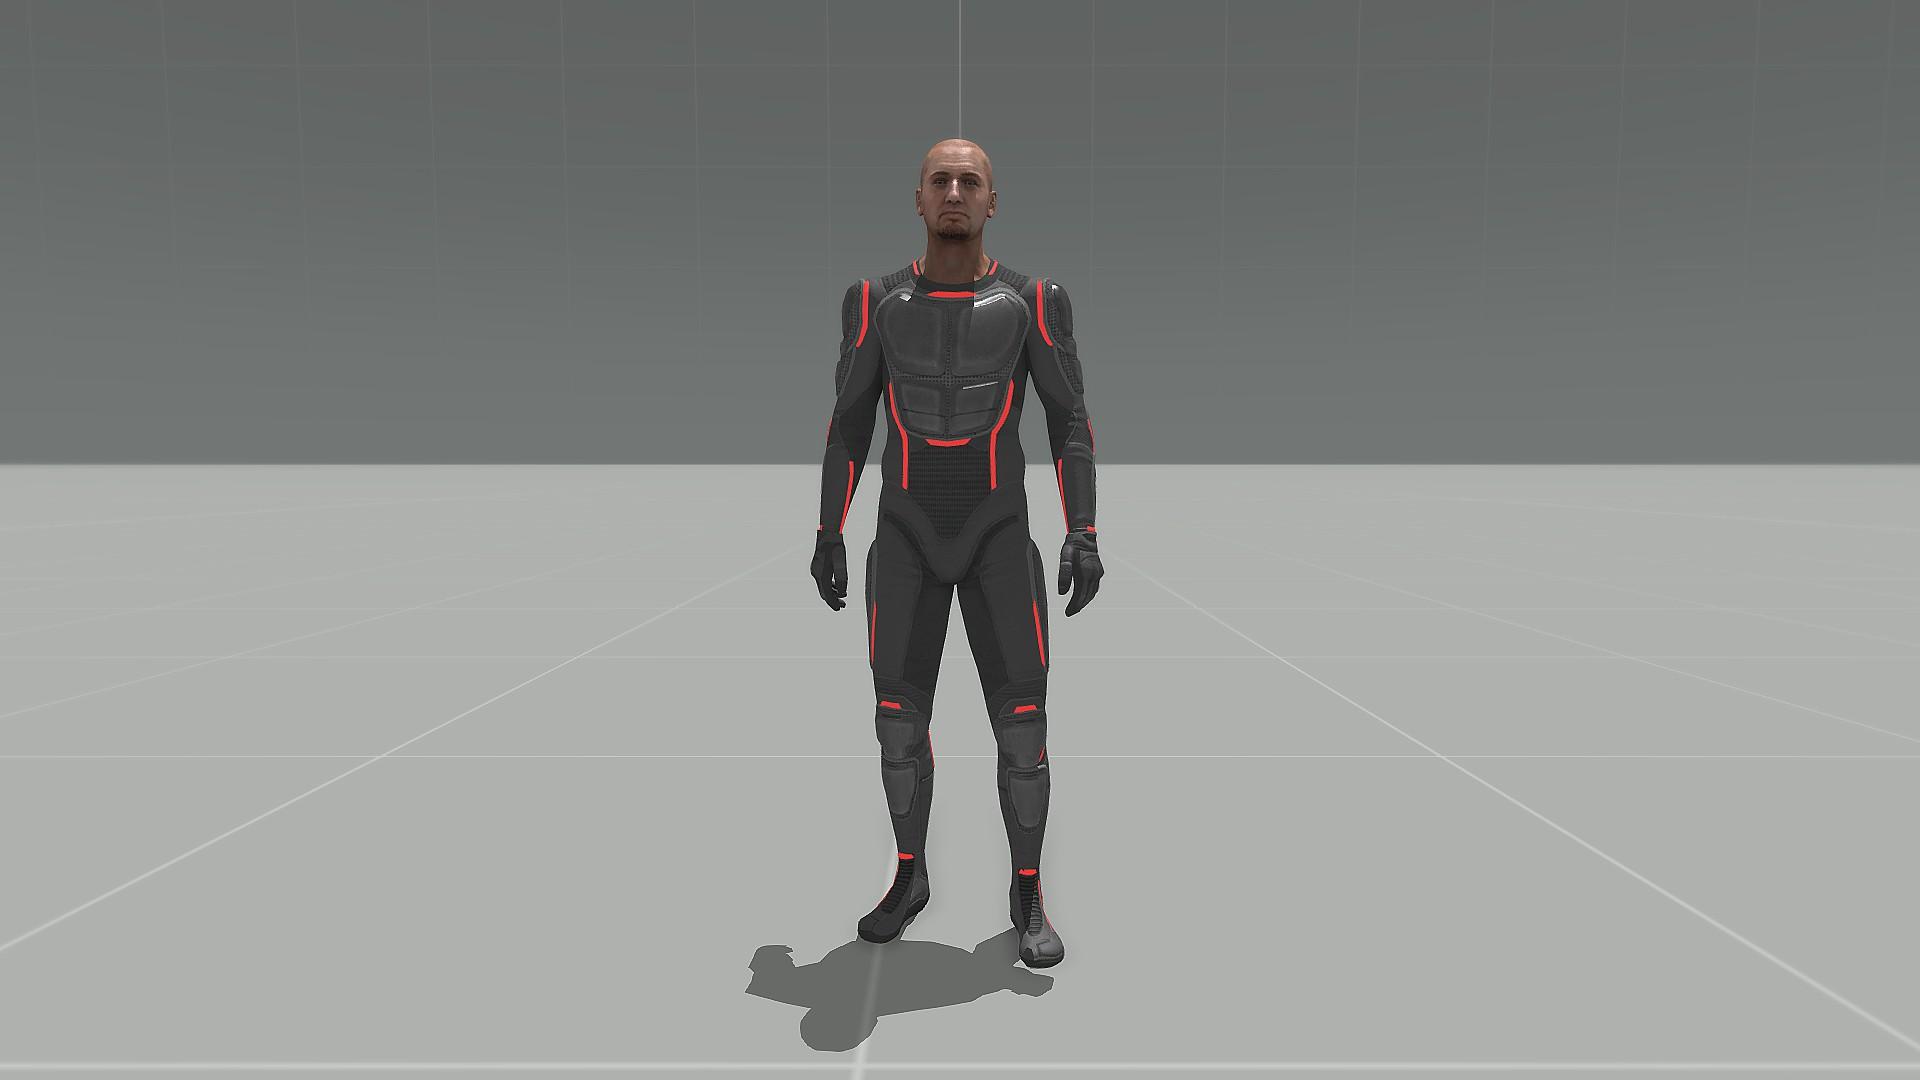 ArmA_U_O_Protagonist_VR.jpg